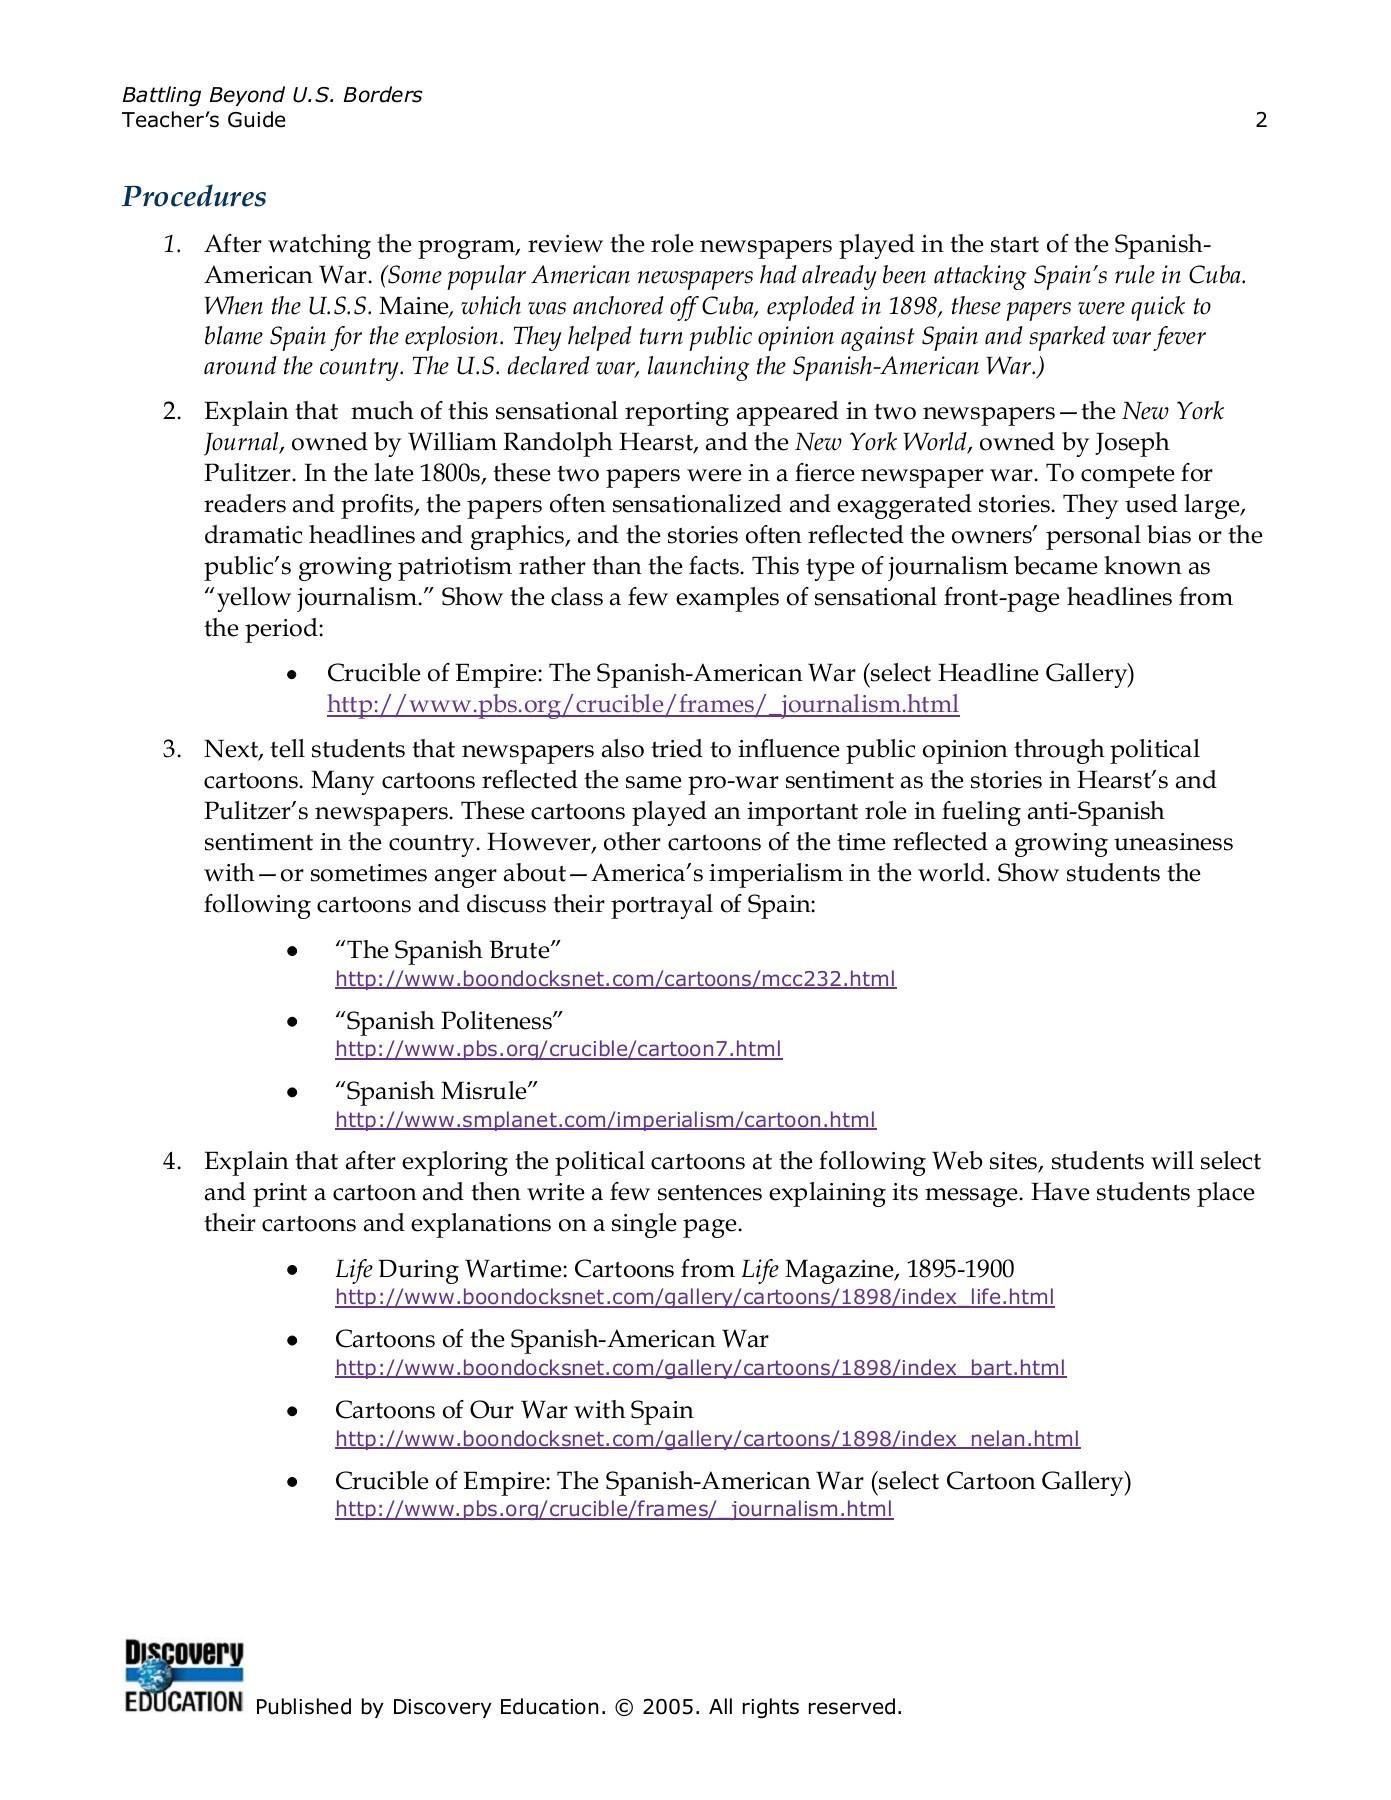 Spanish American War Worksheet Battling Beyond U S Borders Discovery Education Pages 1